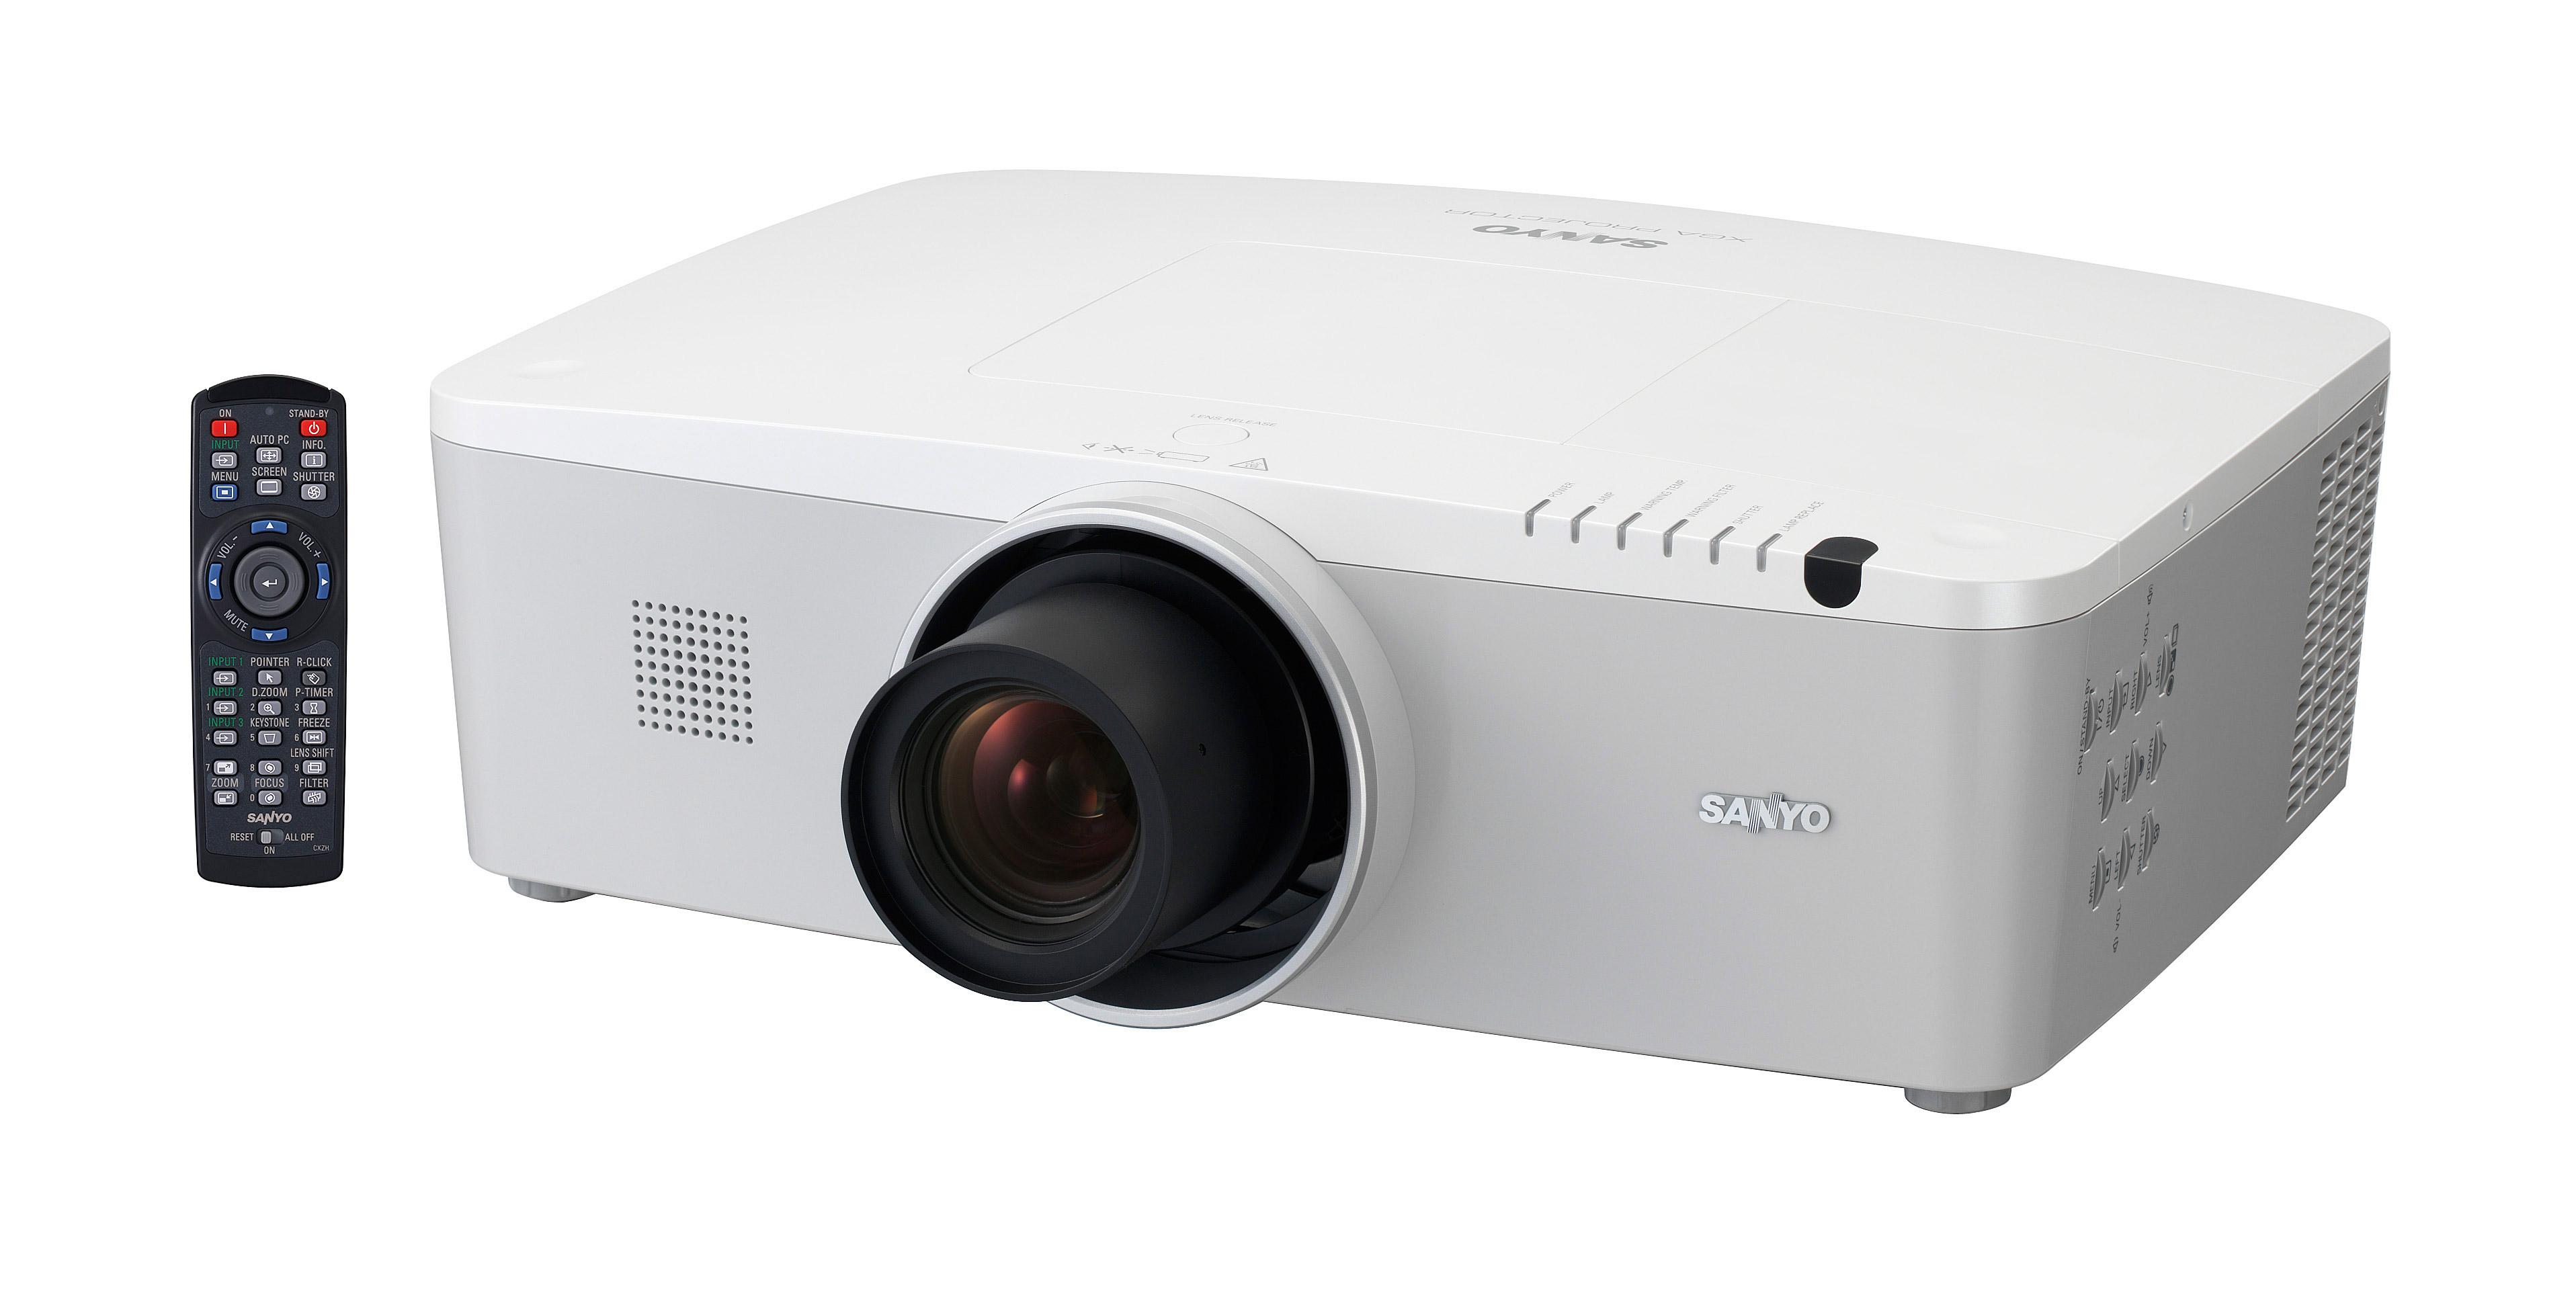 SANYO's PLC-XM150-150L-100-100L Projector